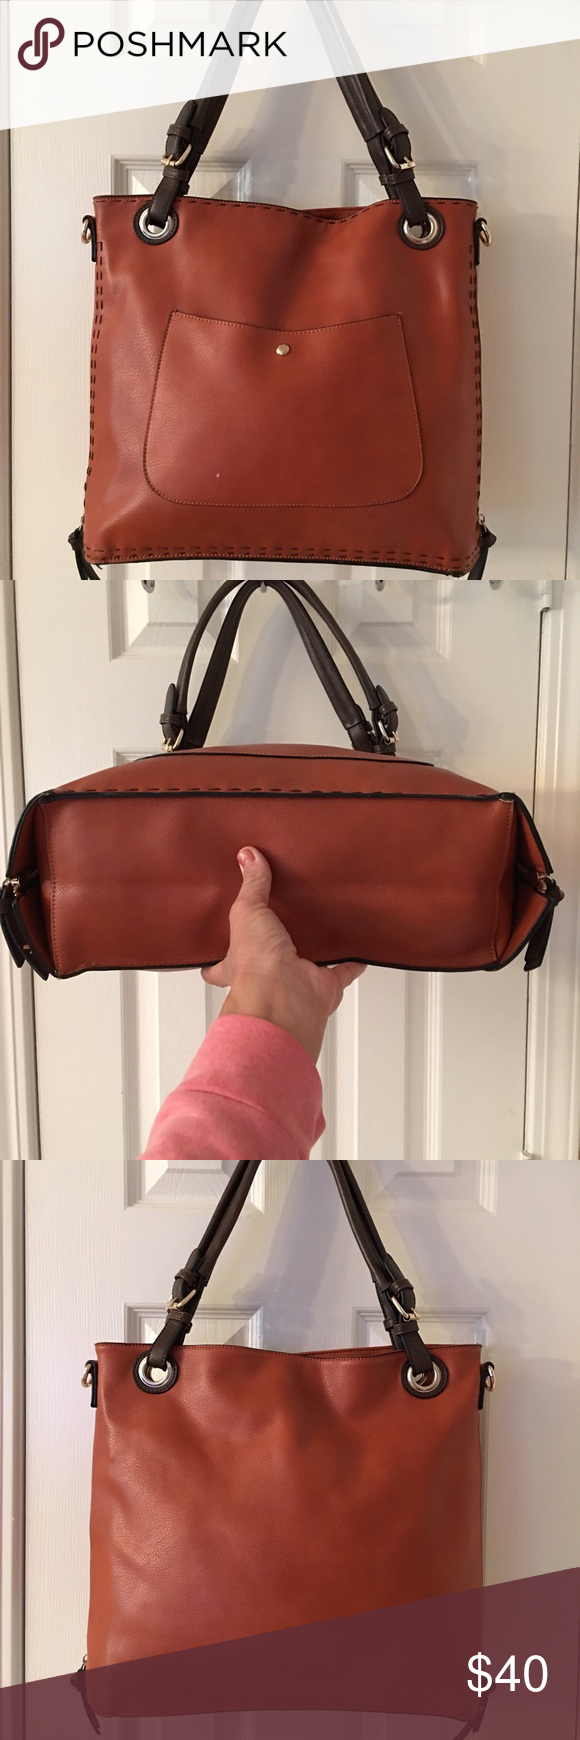 🛍 Brown Large Fashion Shoulder Bag Silver hardware.  Side zippers for expansion.  Front snap pocket.  Main zip closure.  3 interior pockets (1 zips).  Key clip. Small mark on front of bag.  Measures: 16.75x5x13x8. Man made. Independent Designer Bags Shoulder Bags